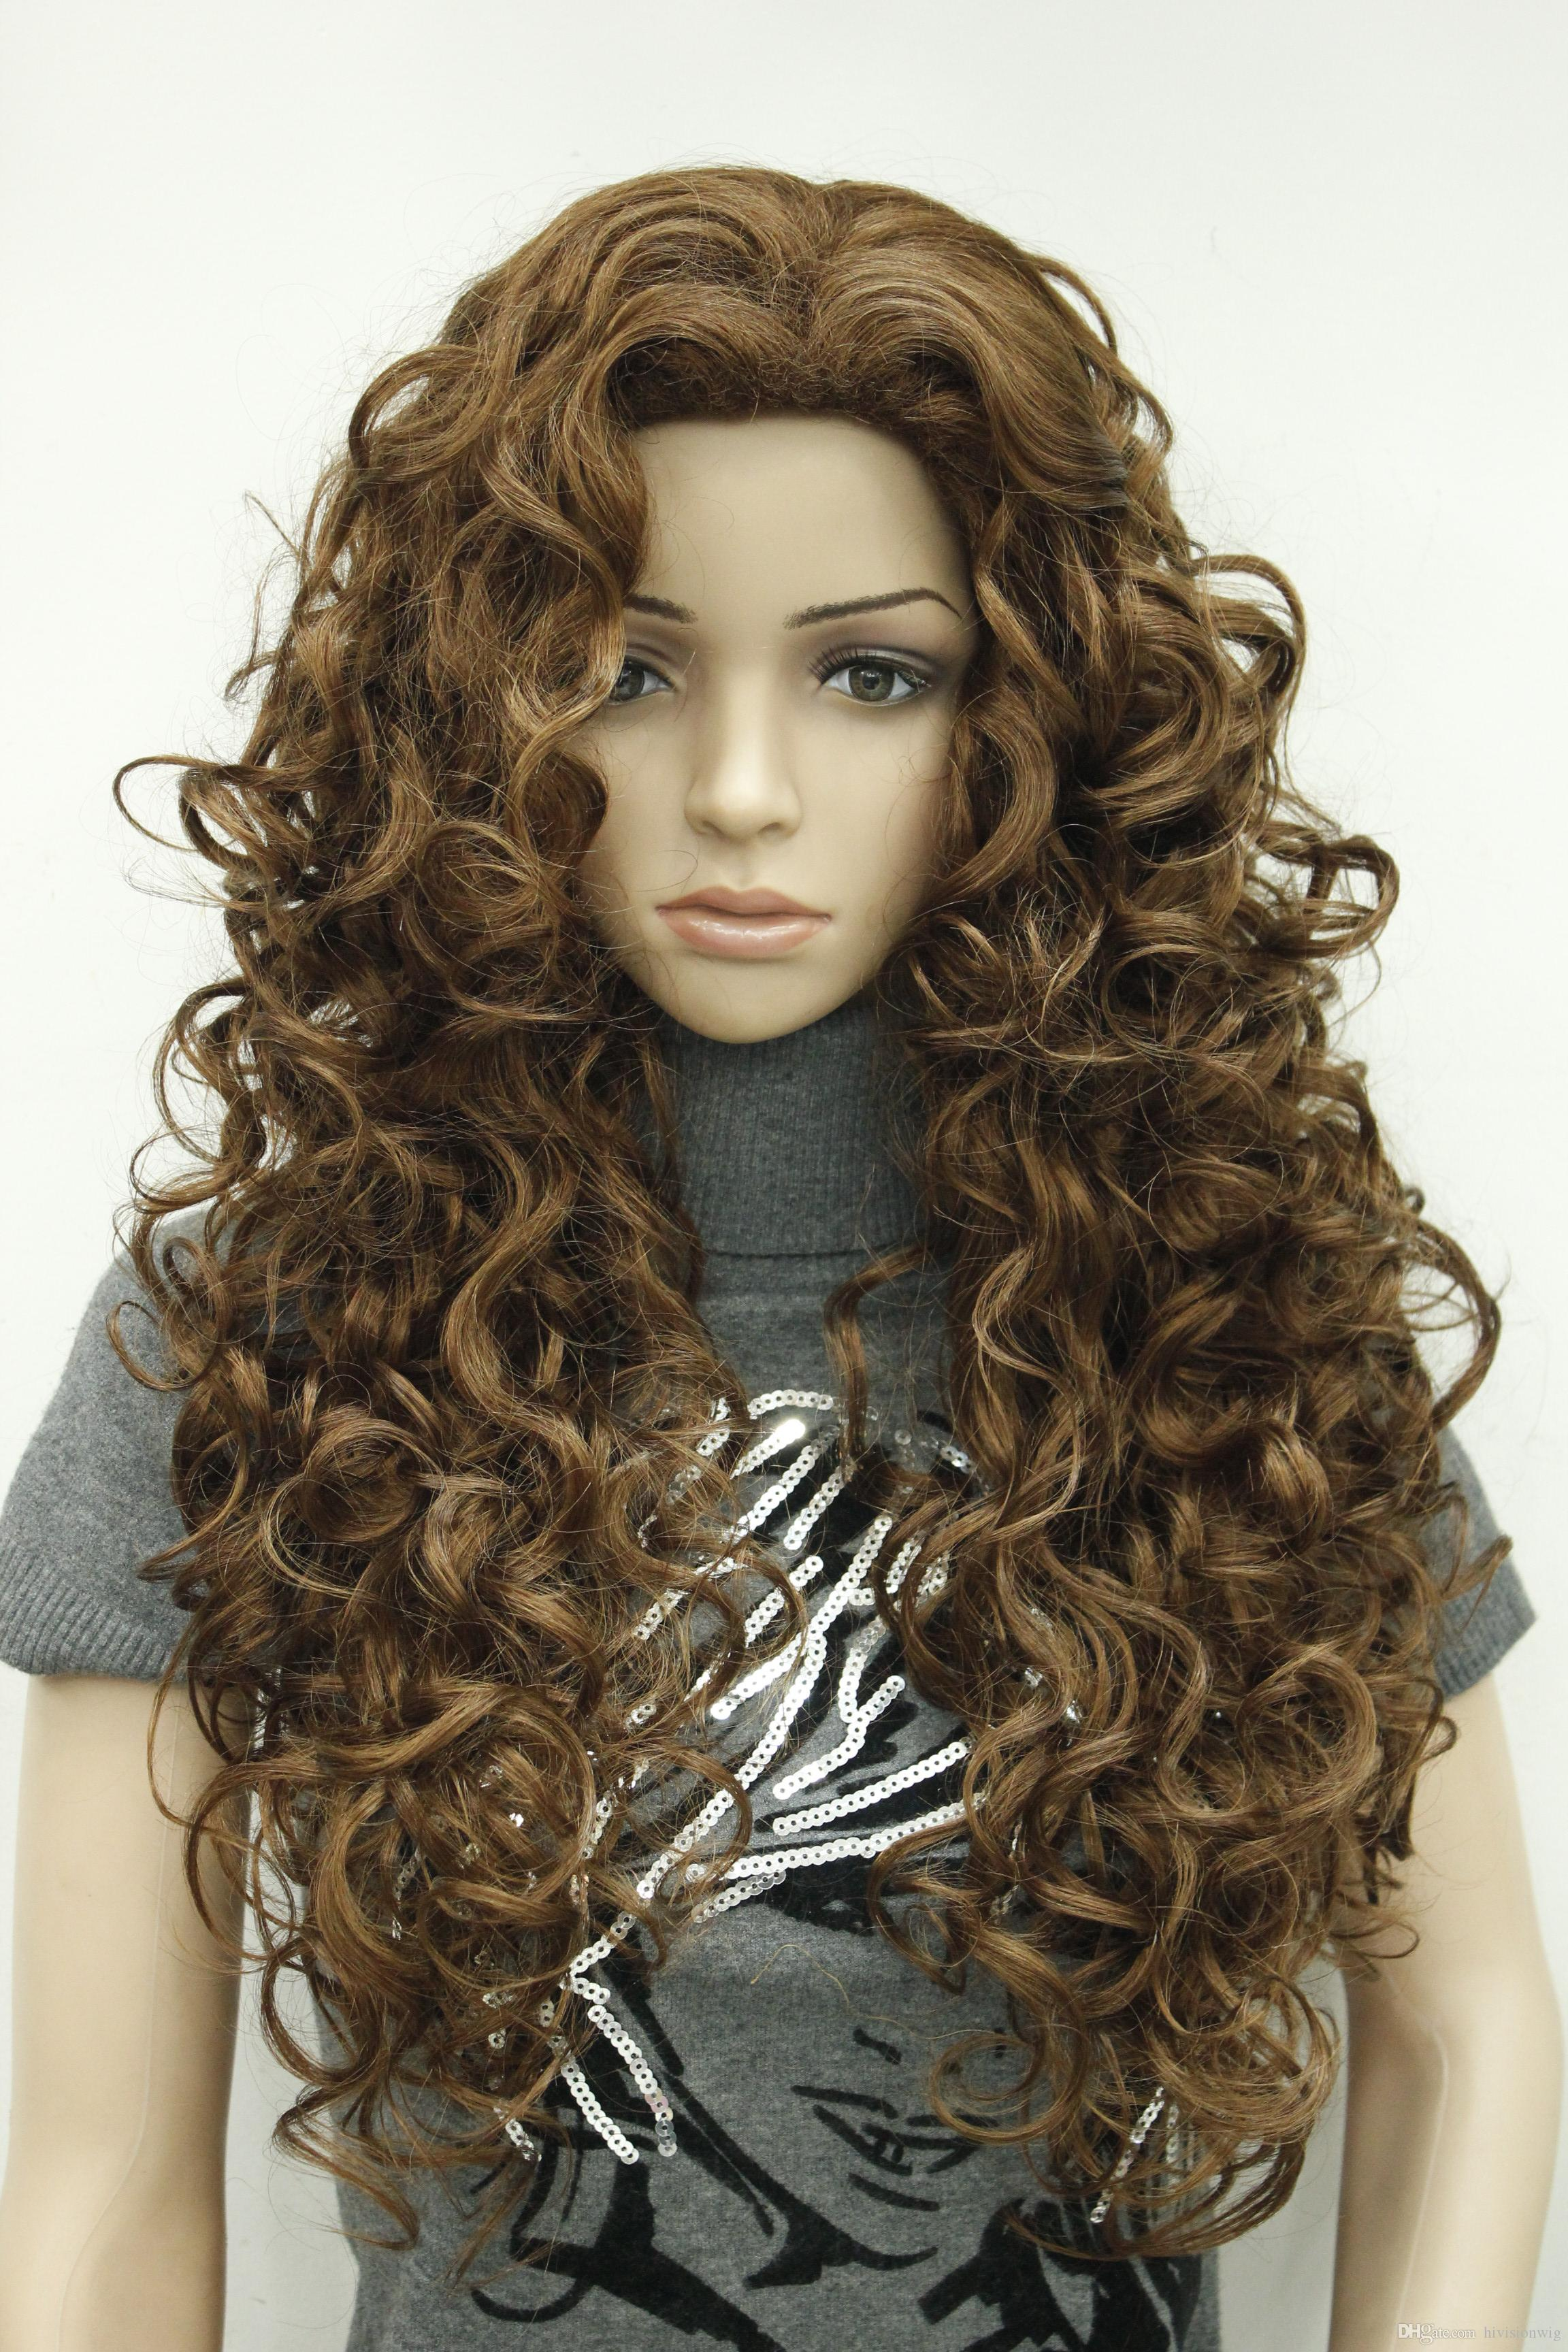 New super hot fashion sexy charming Medium Auburn long curly woman's full thick wig free shipping